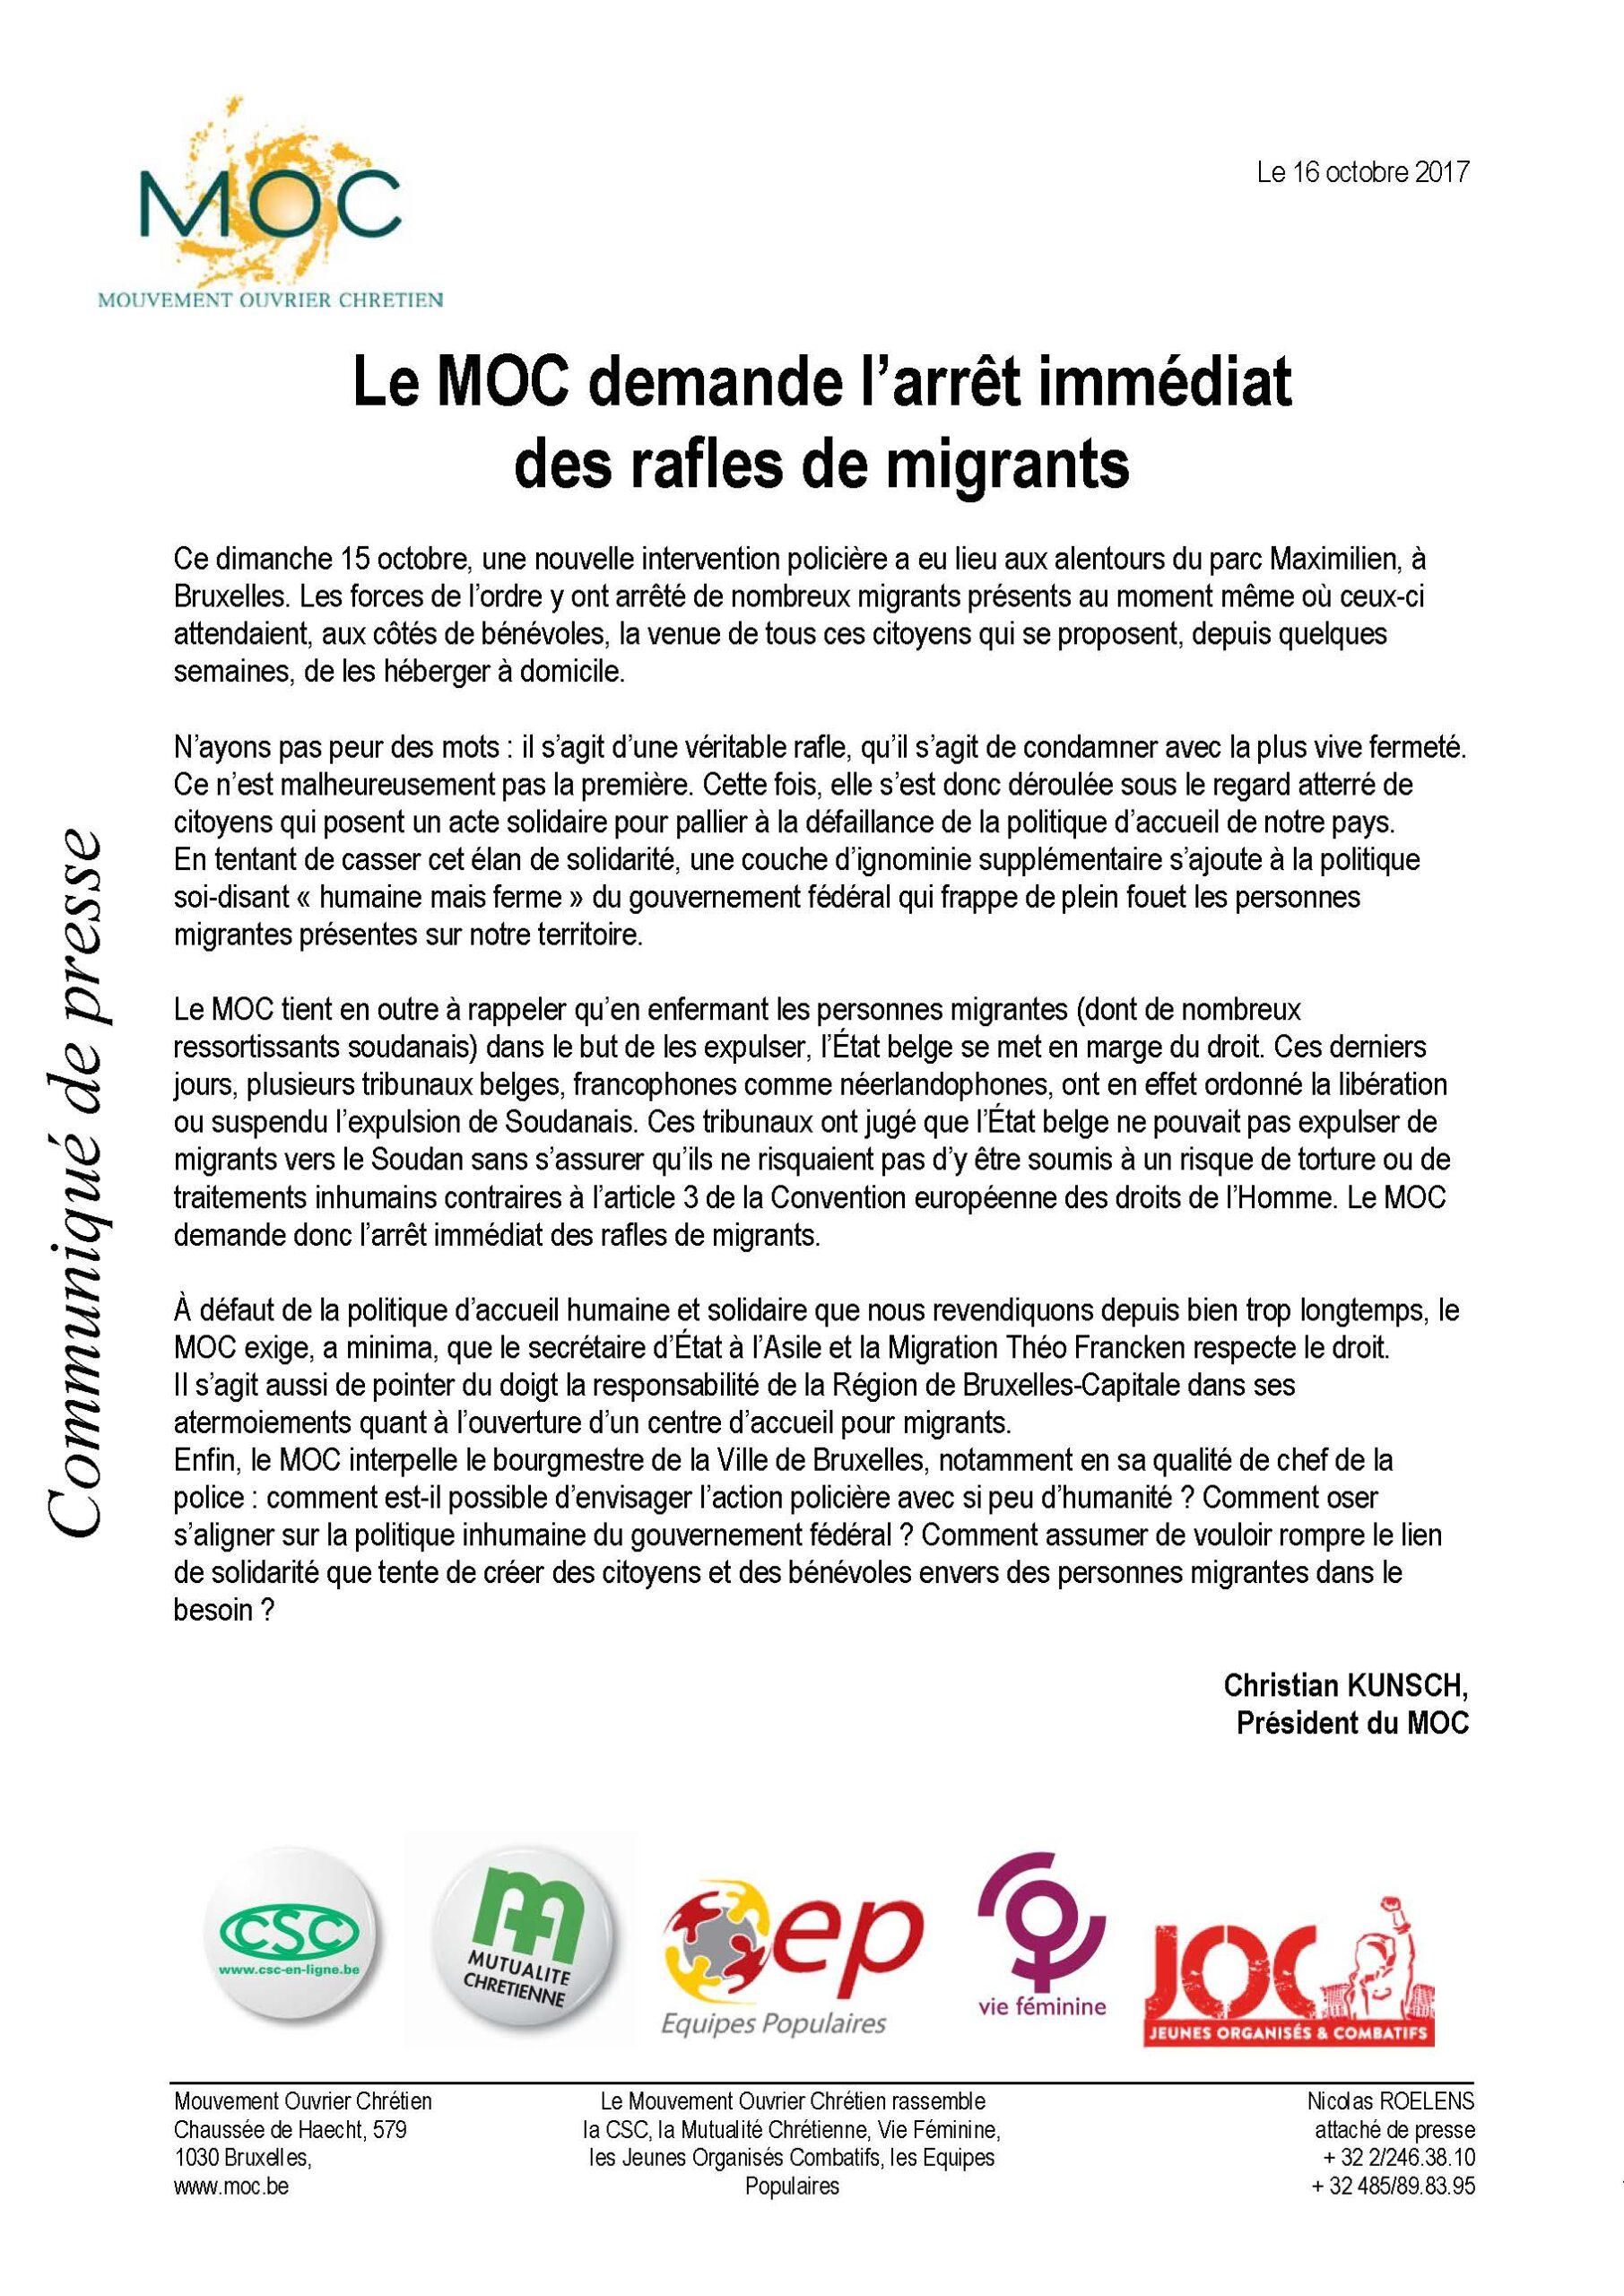 Le MOC demande l'arrêt immédiat des rafles de migrants